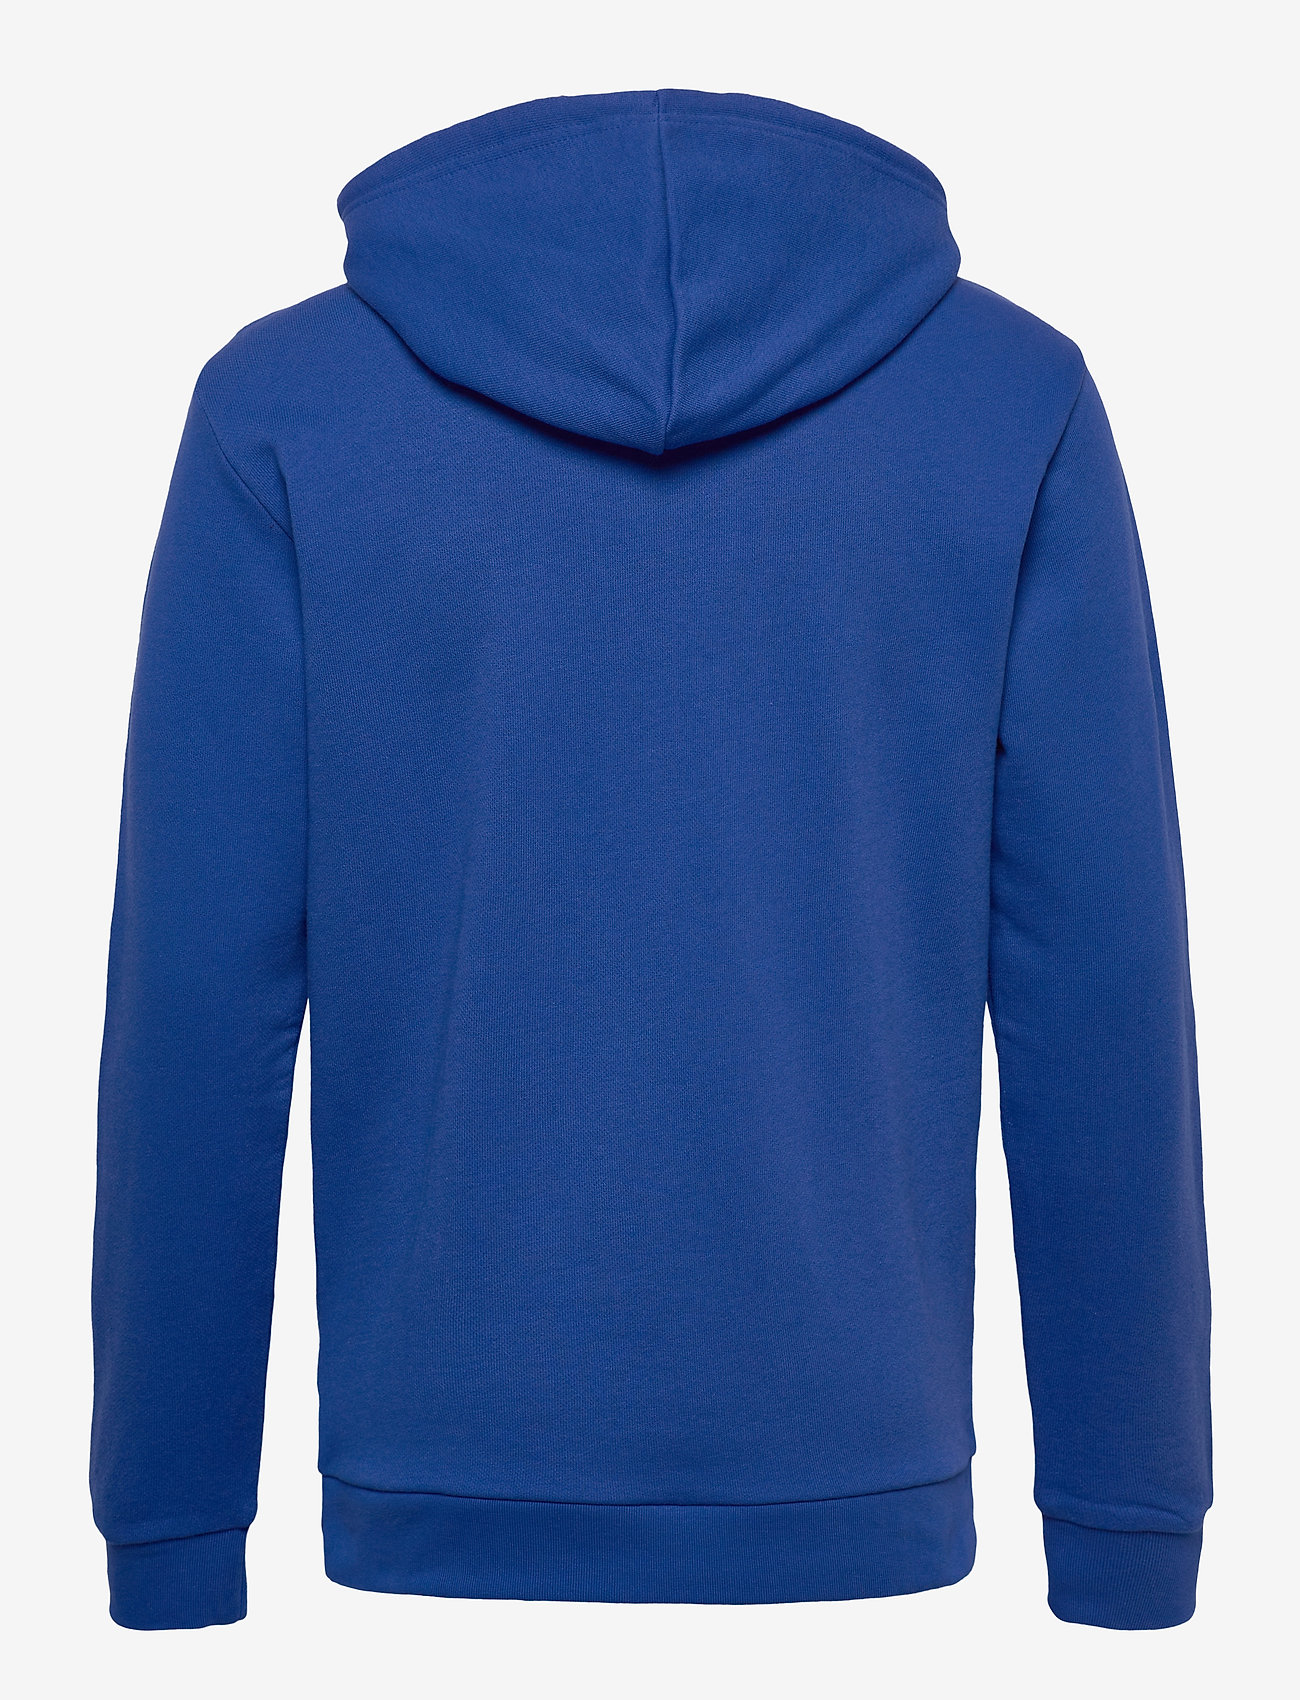 adidas Originals ESSENTIAL HOODY - Sweatshirts ROYBLU - Menn Klær